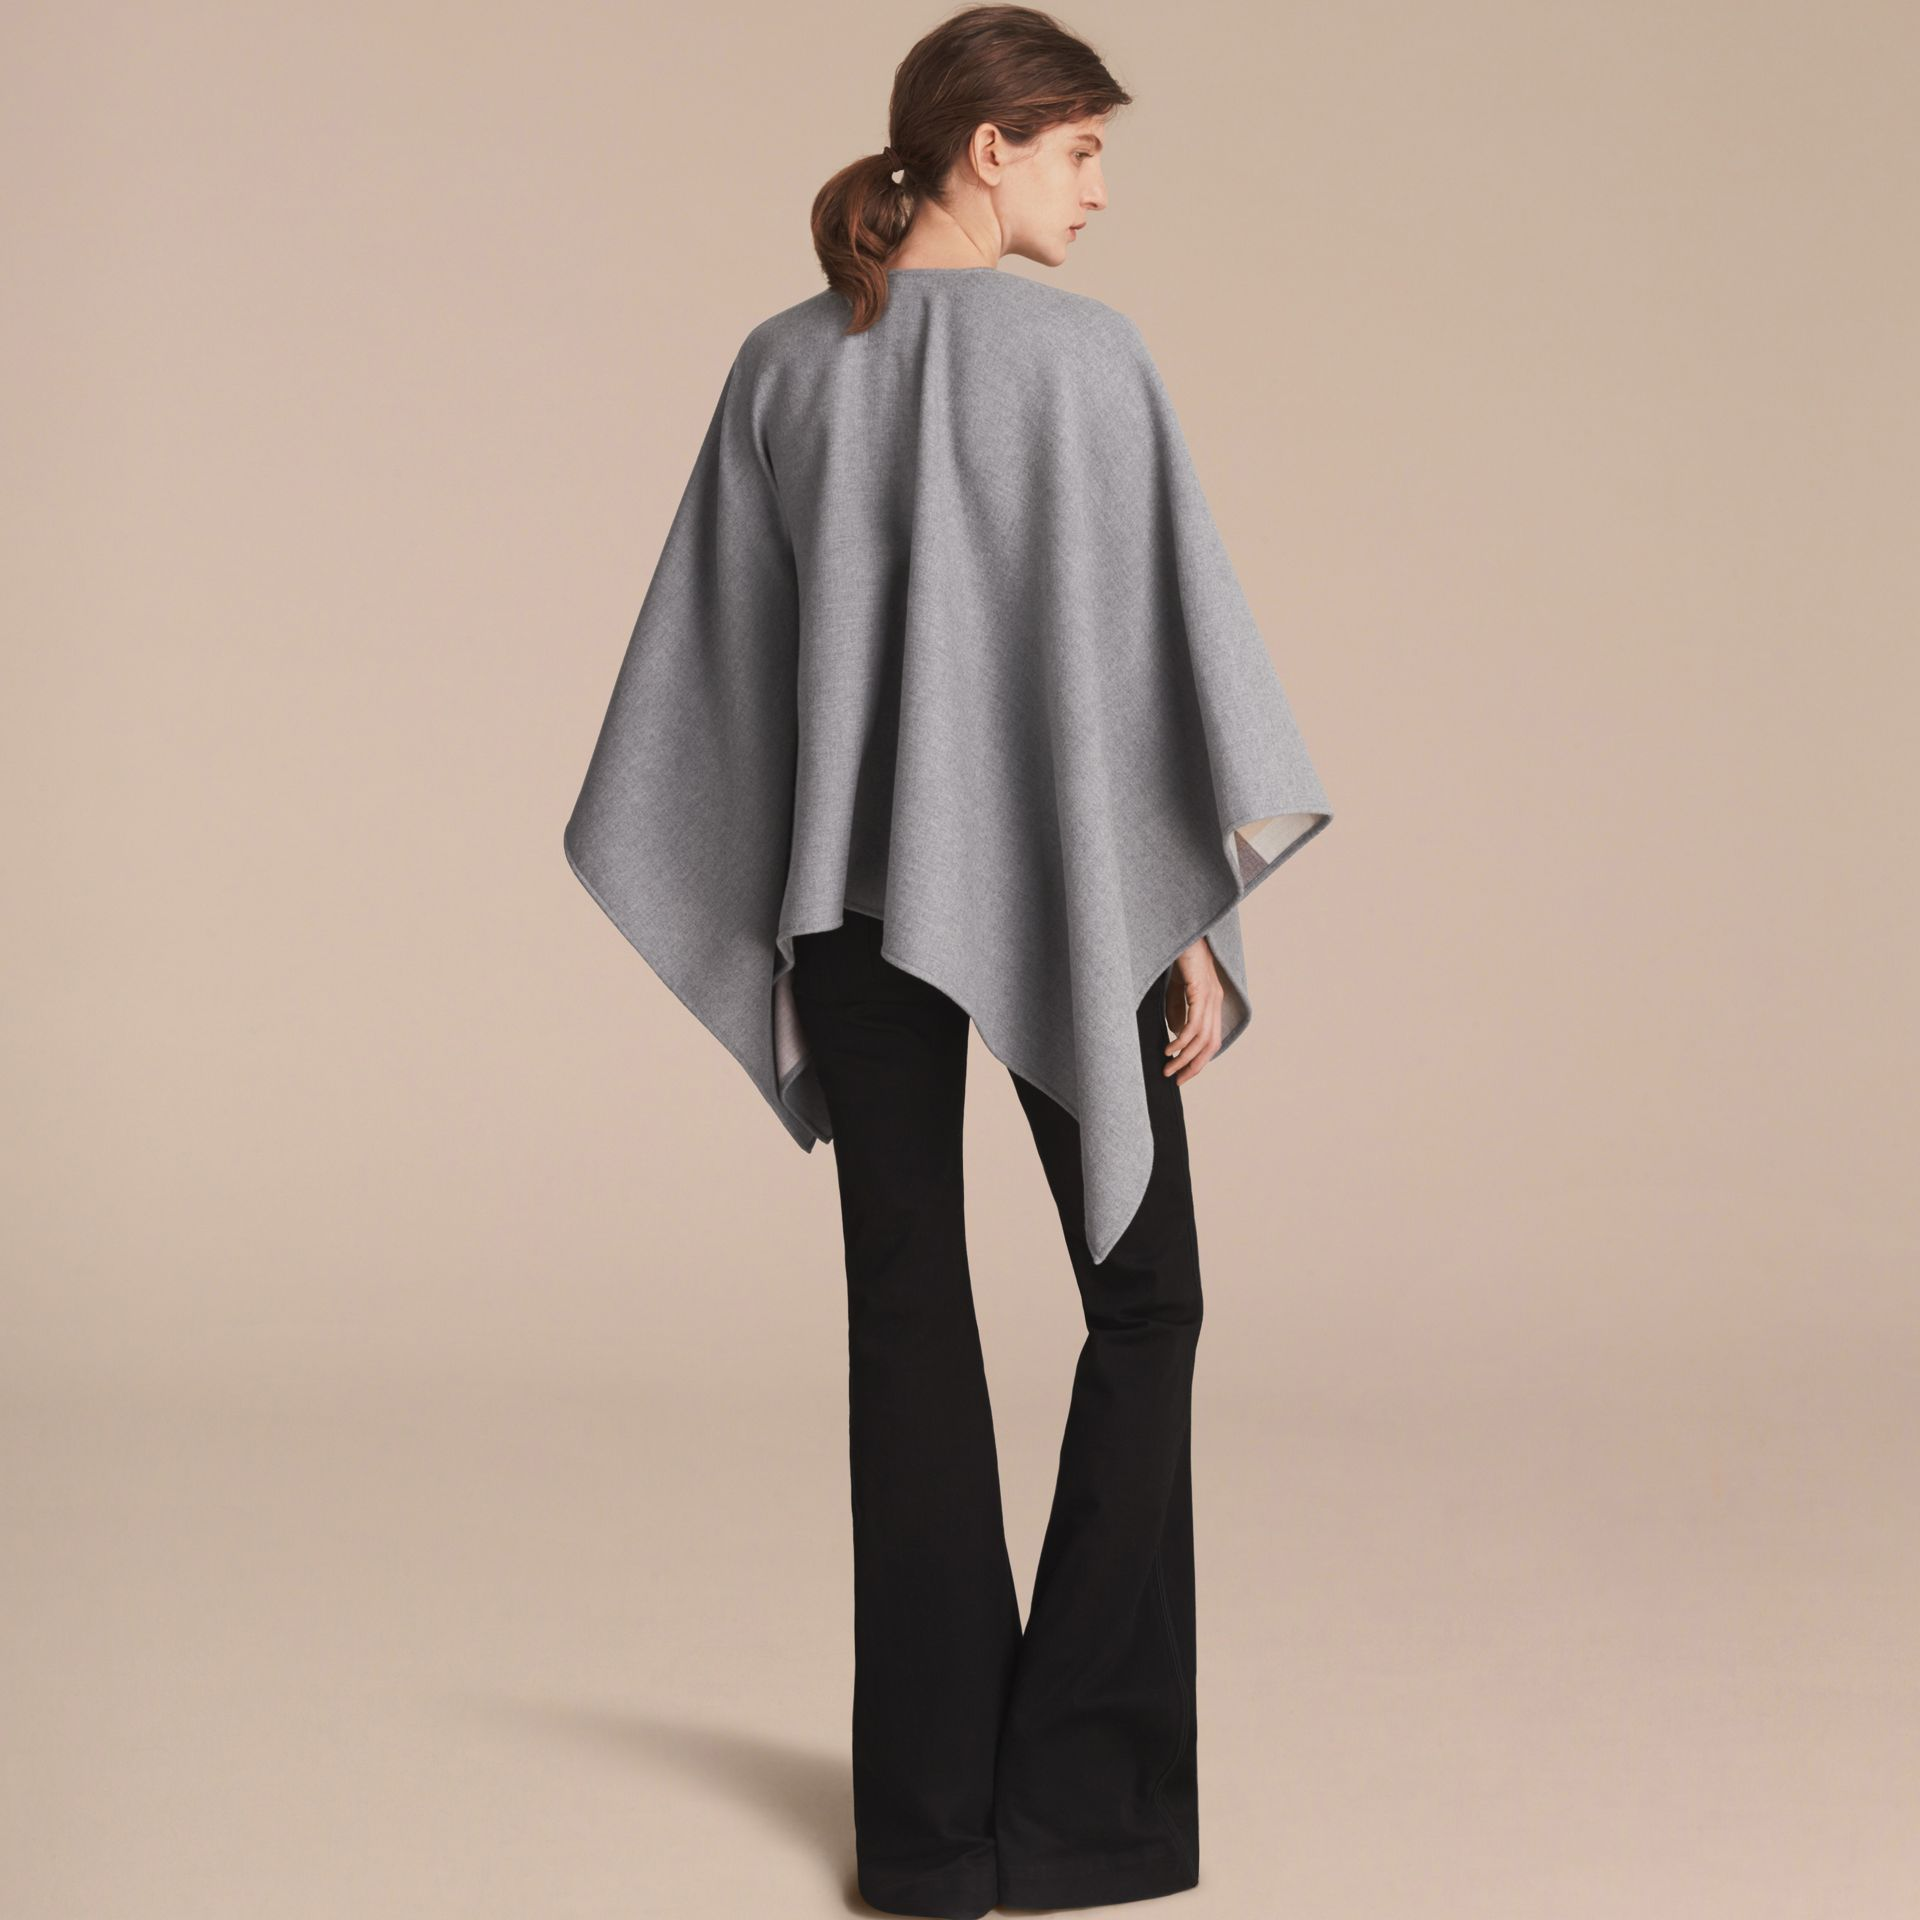 Merino Wool Poncho in Light Grey - Women | Burberry Canada - gallery image 3